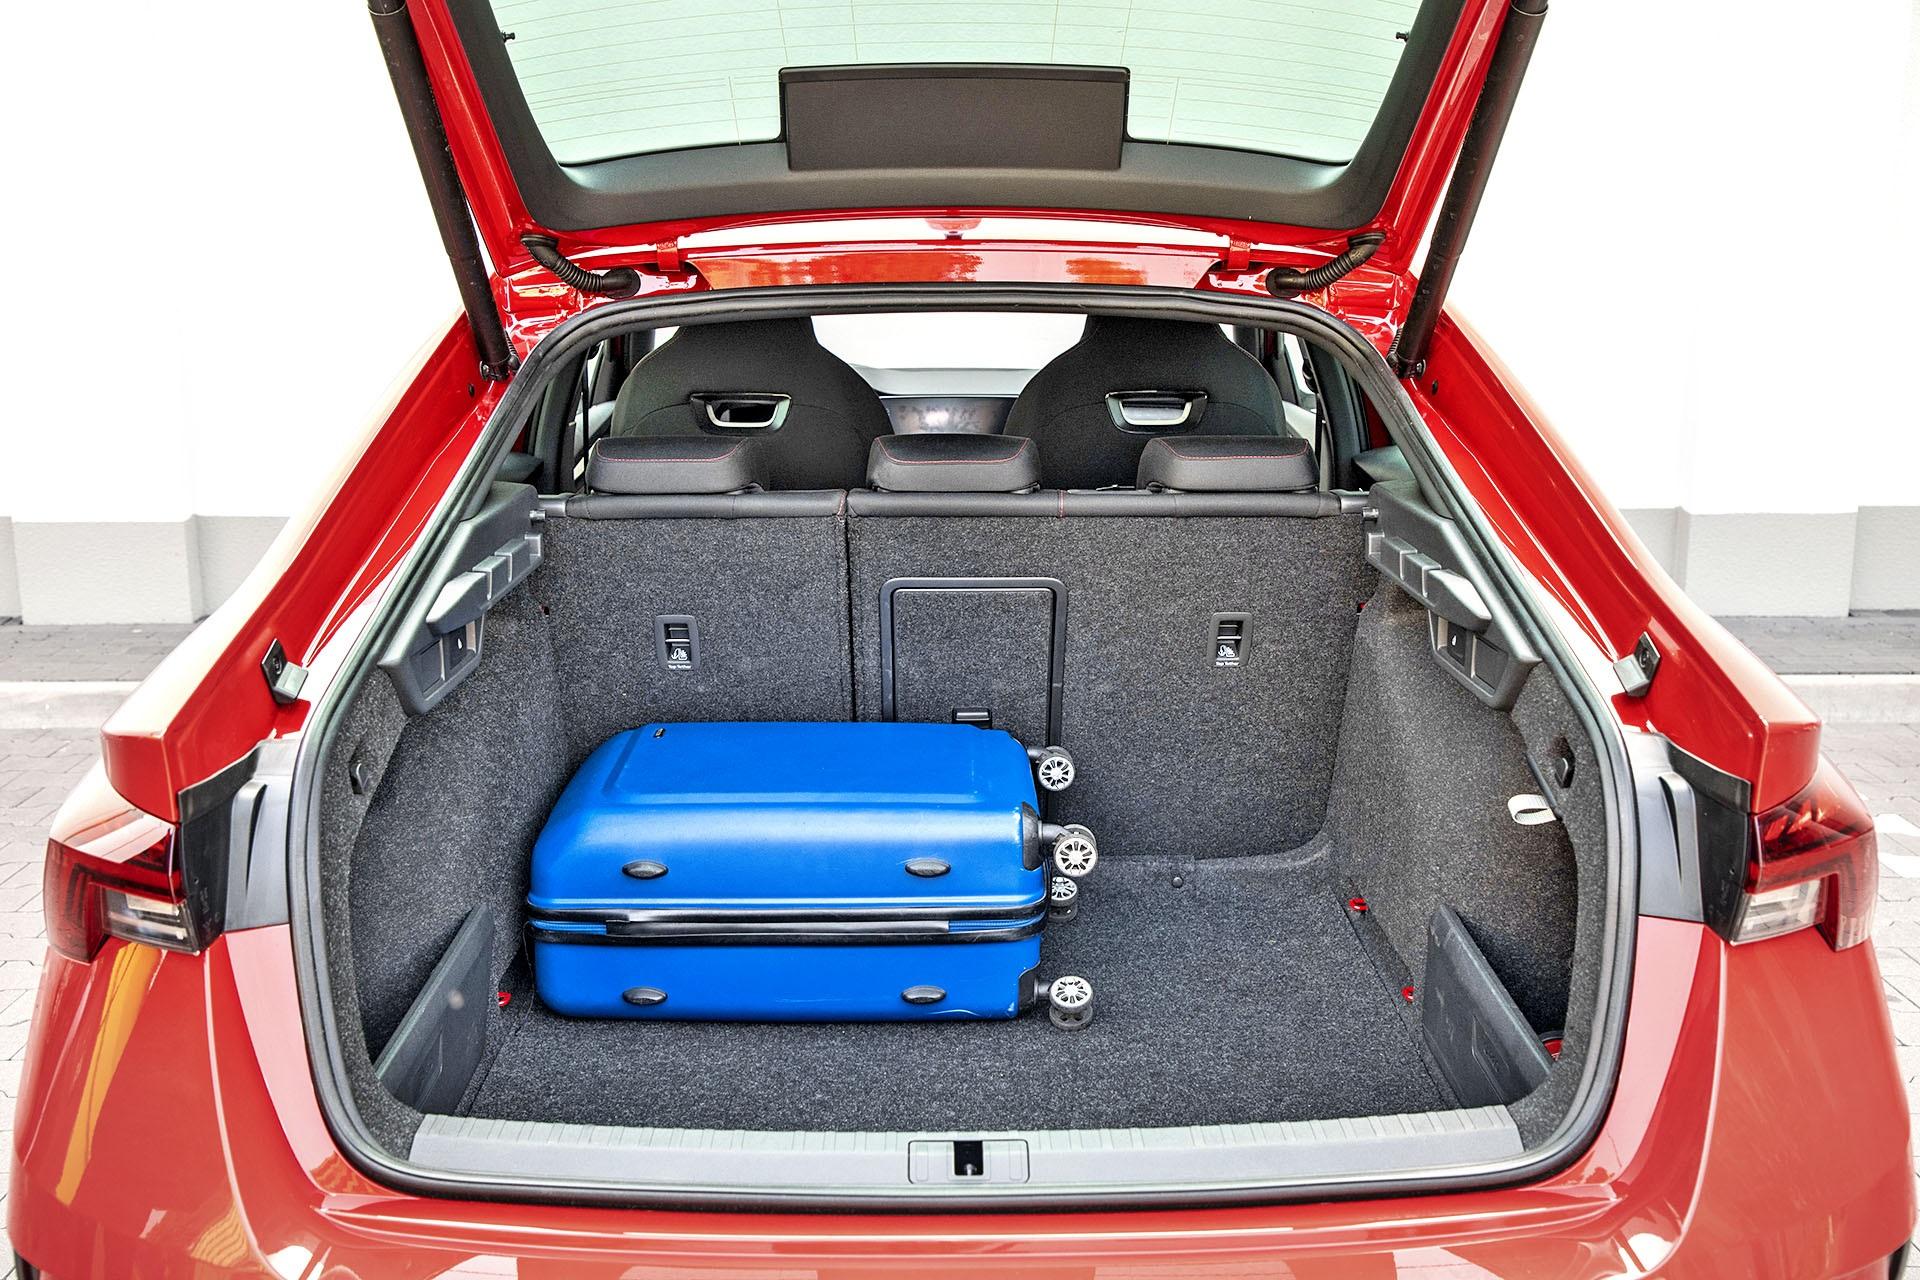 2021 Skoda Octavia RS 2.0 TSI 245 DSG - bagażnik